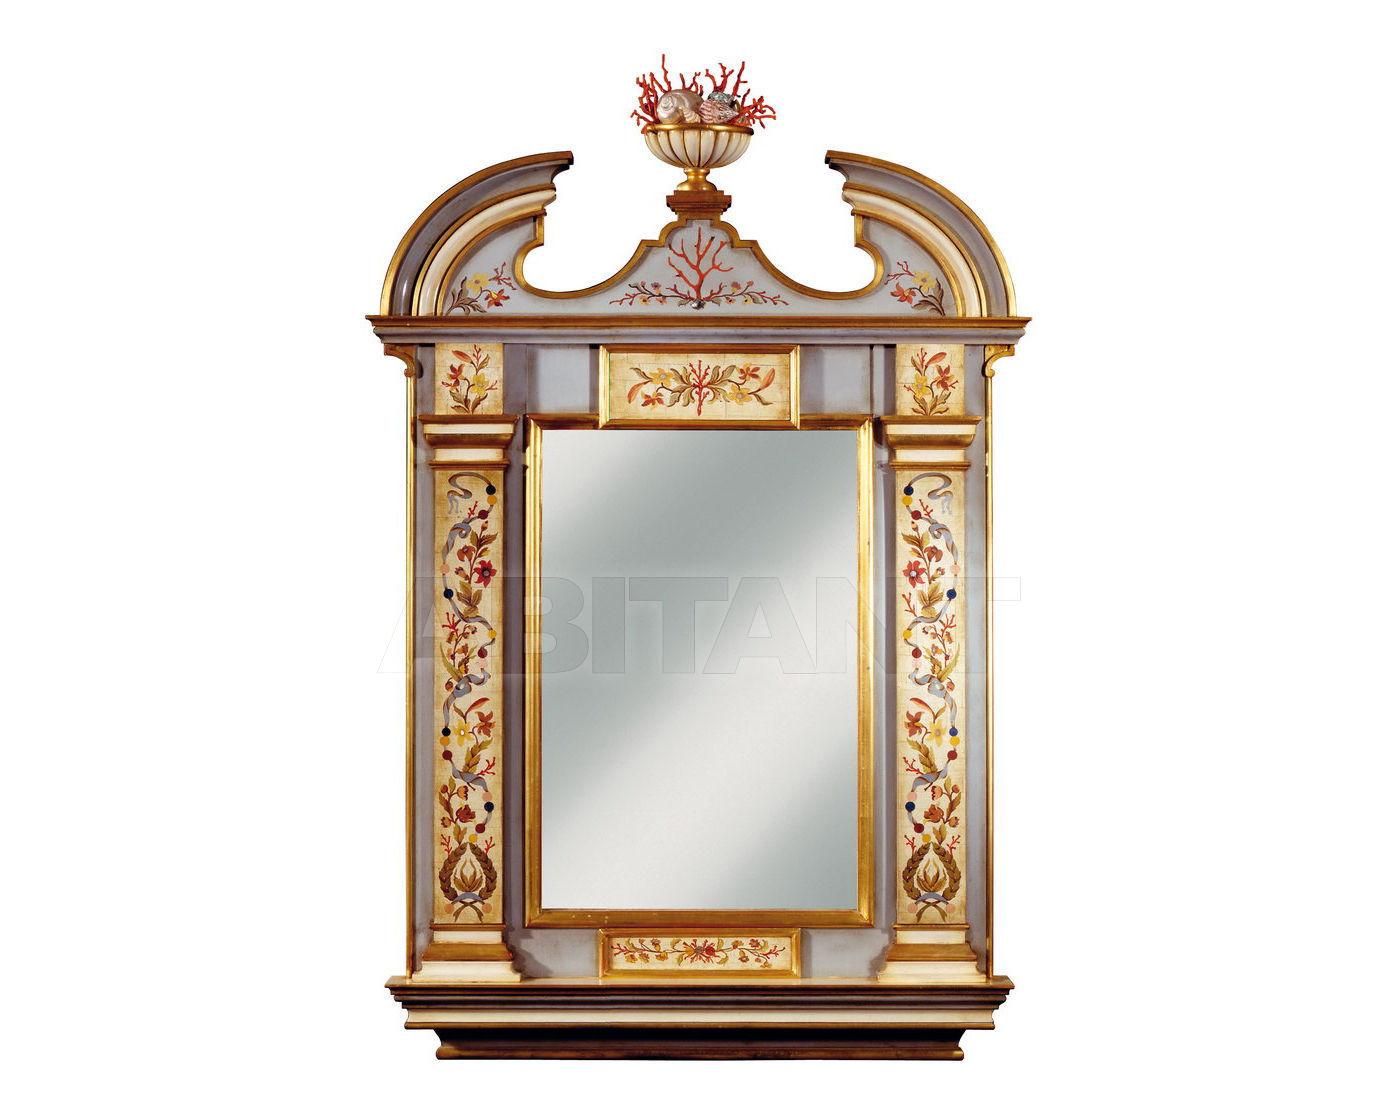 Купить Зеркало настенное Colombostile s.p.a. 2010 1646 SP